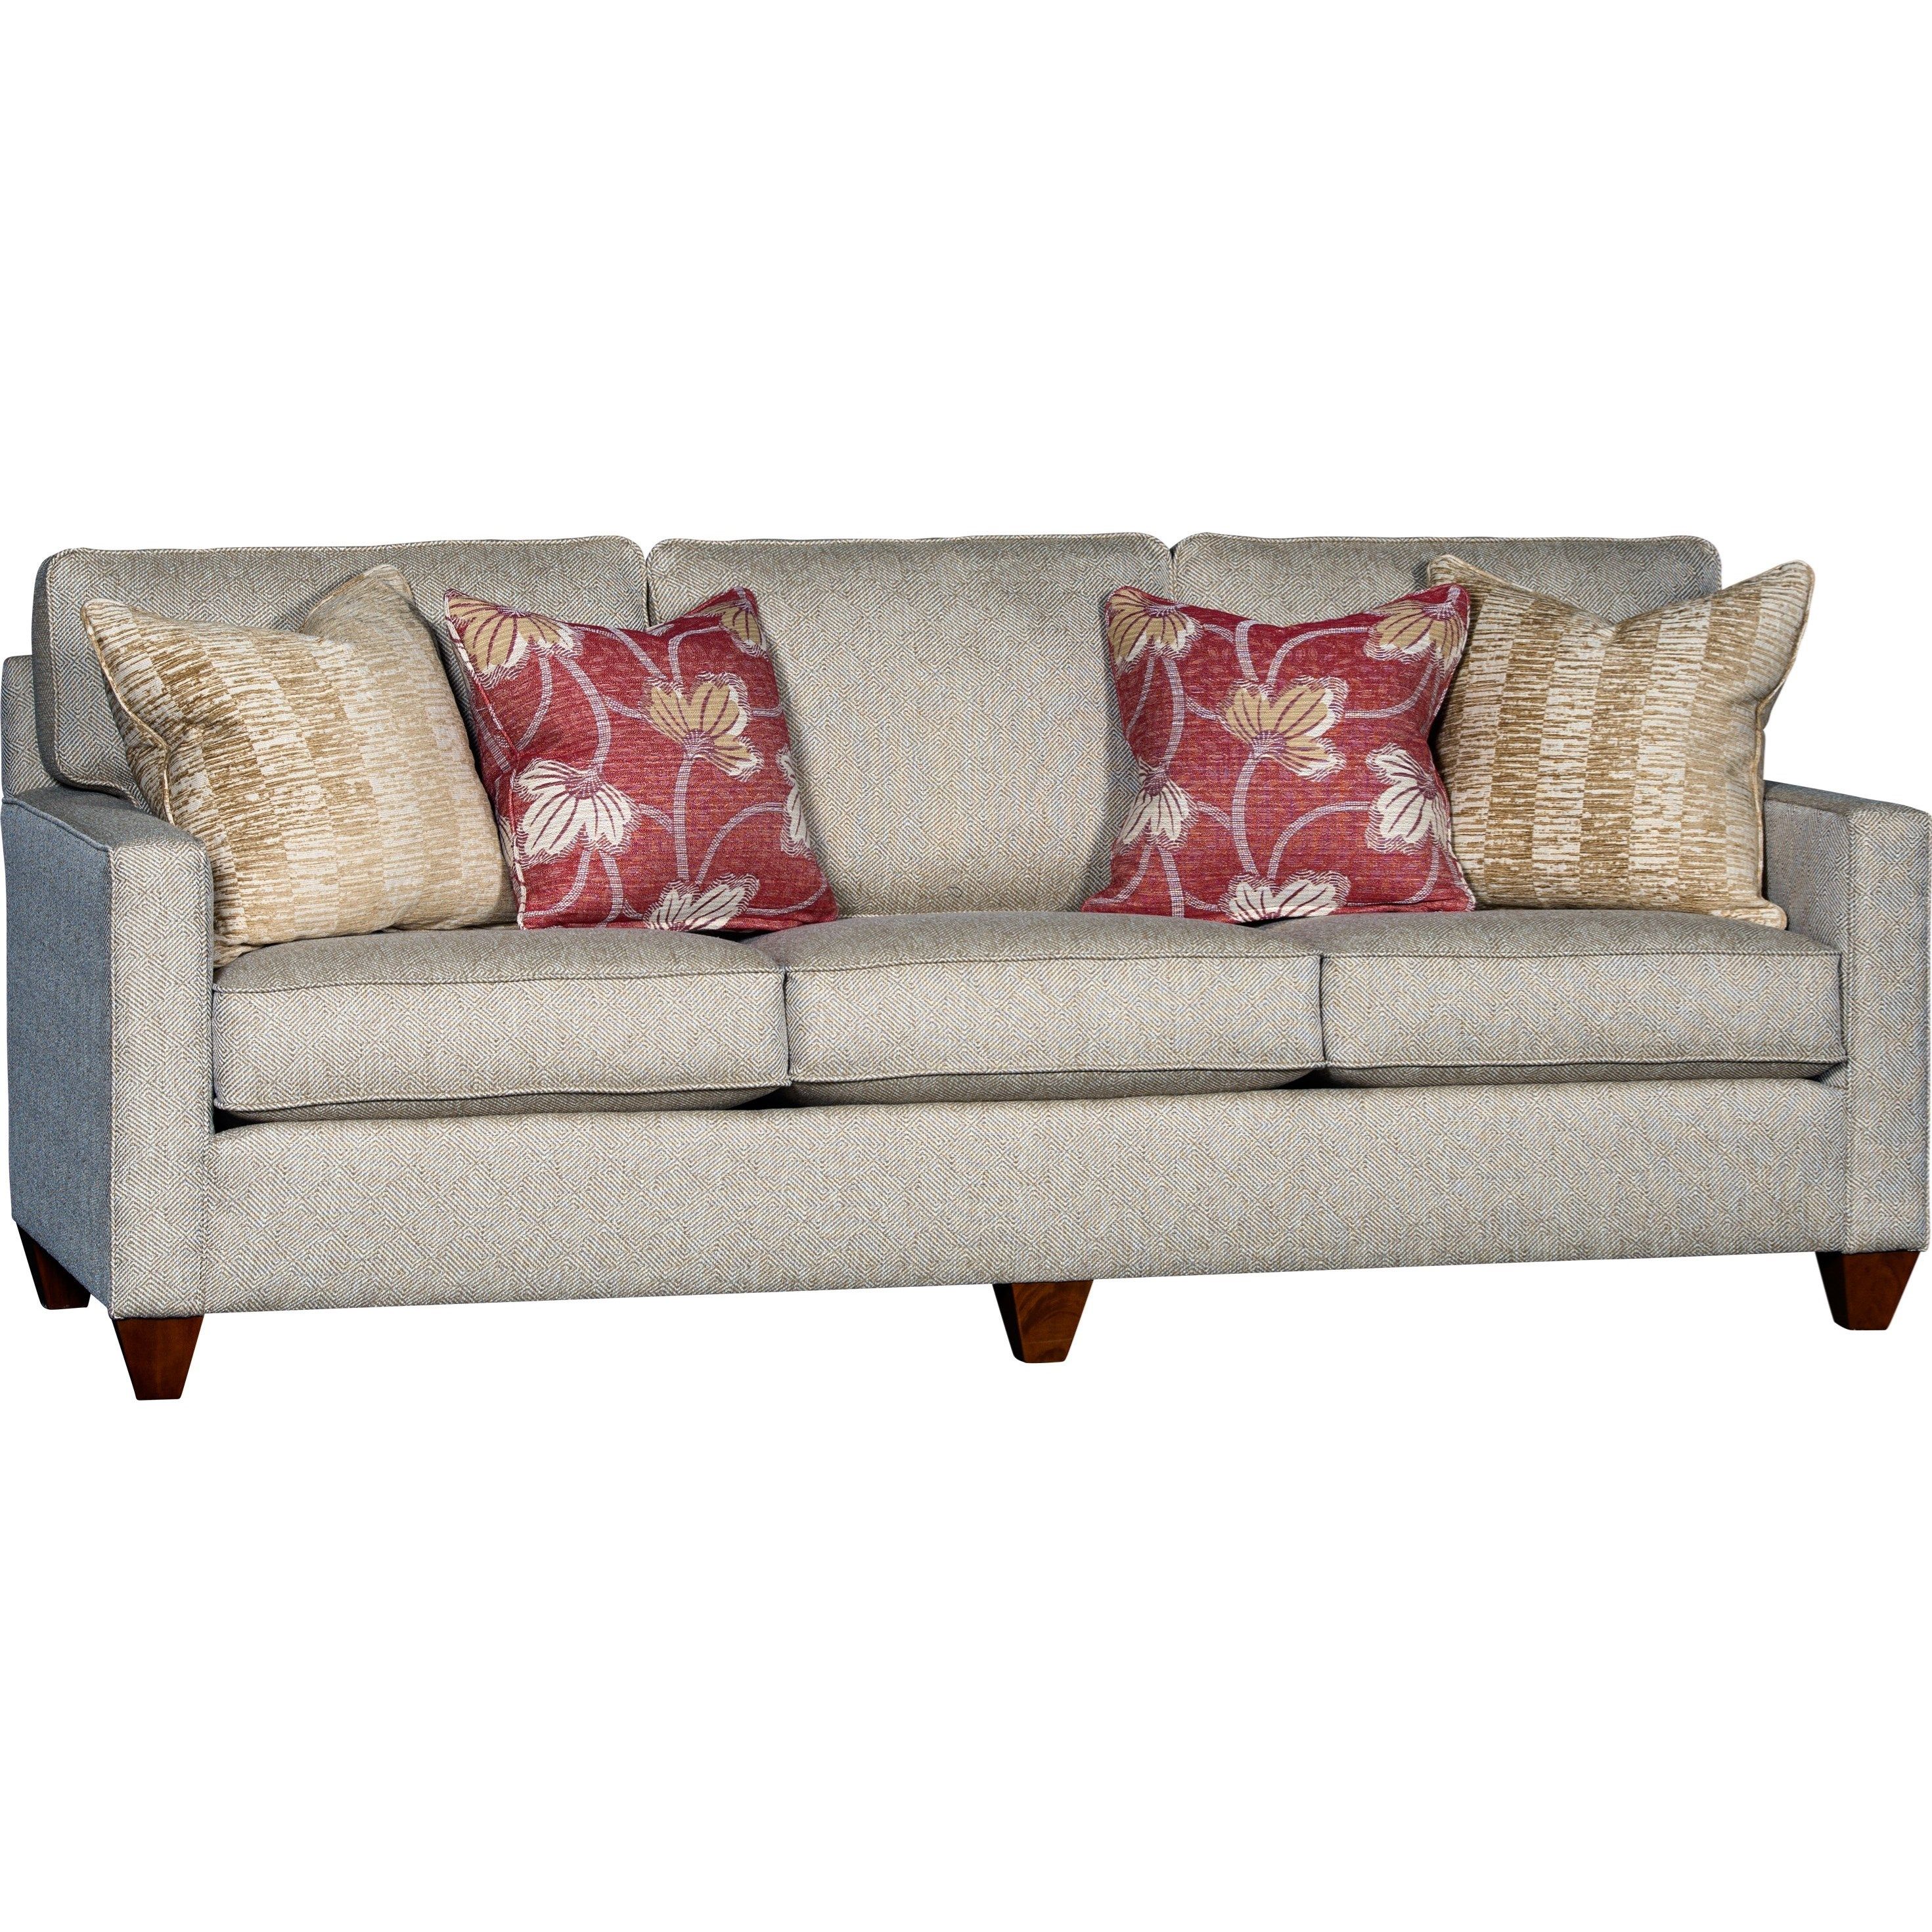 Mayo 3830 Sofa - Item Number: 3830F10-Patmos_Brass